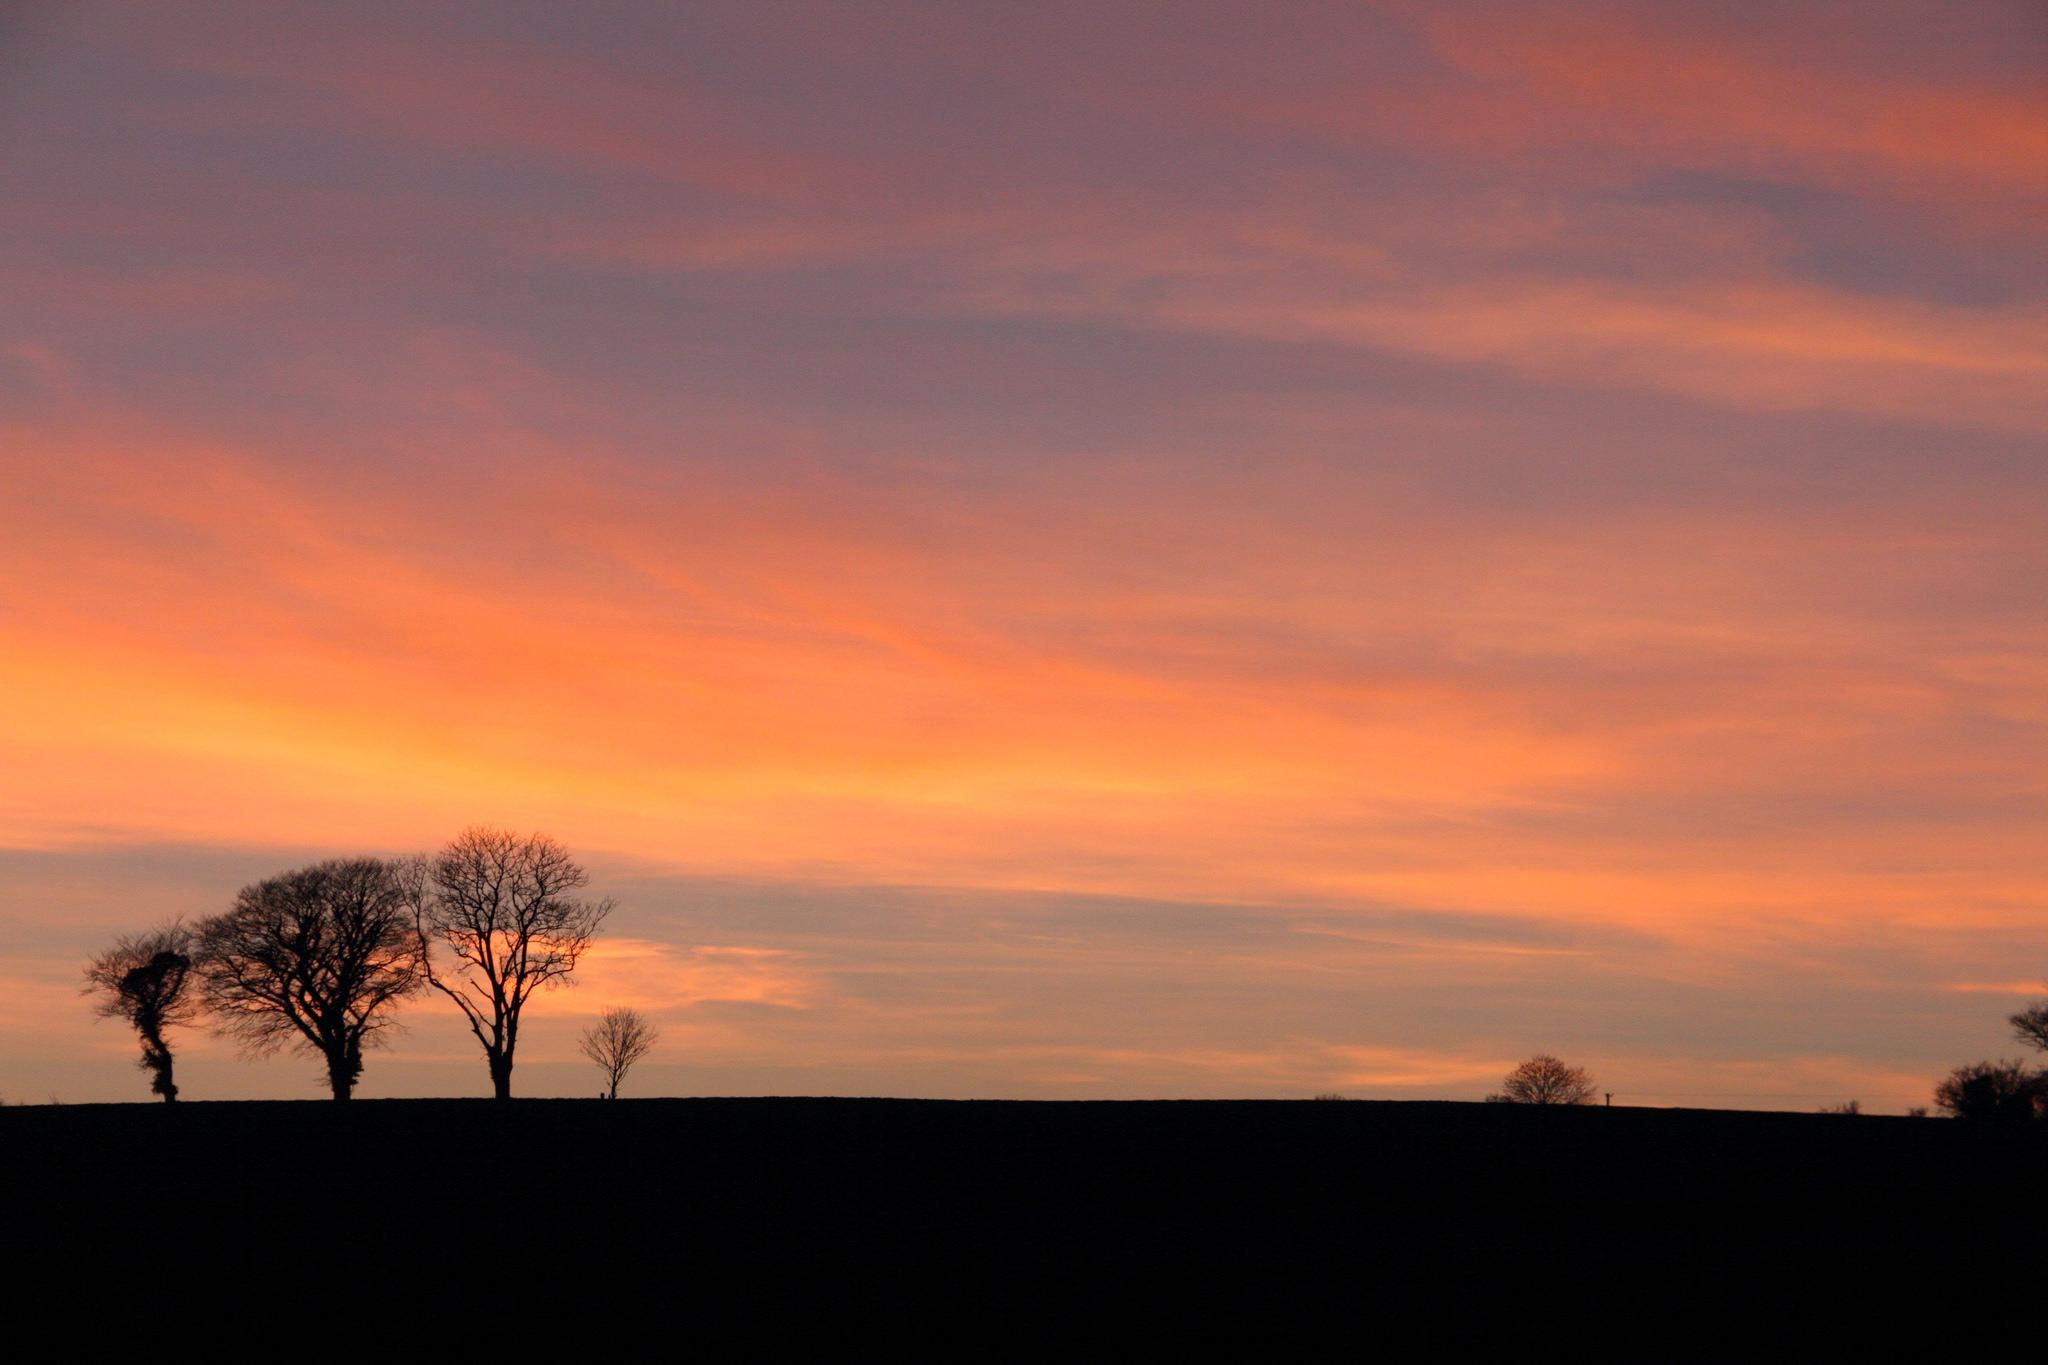 evening sunset, Clonmel